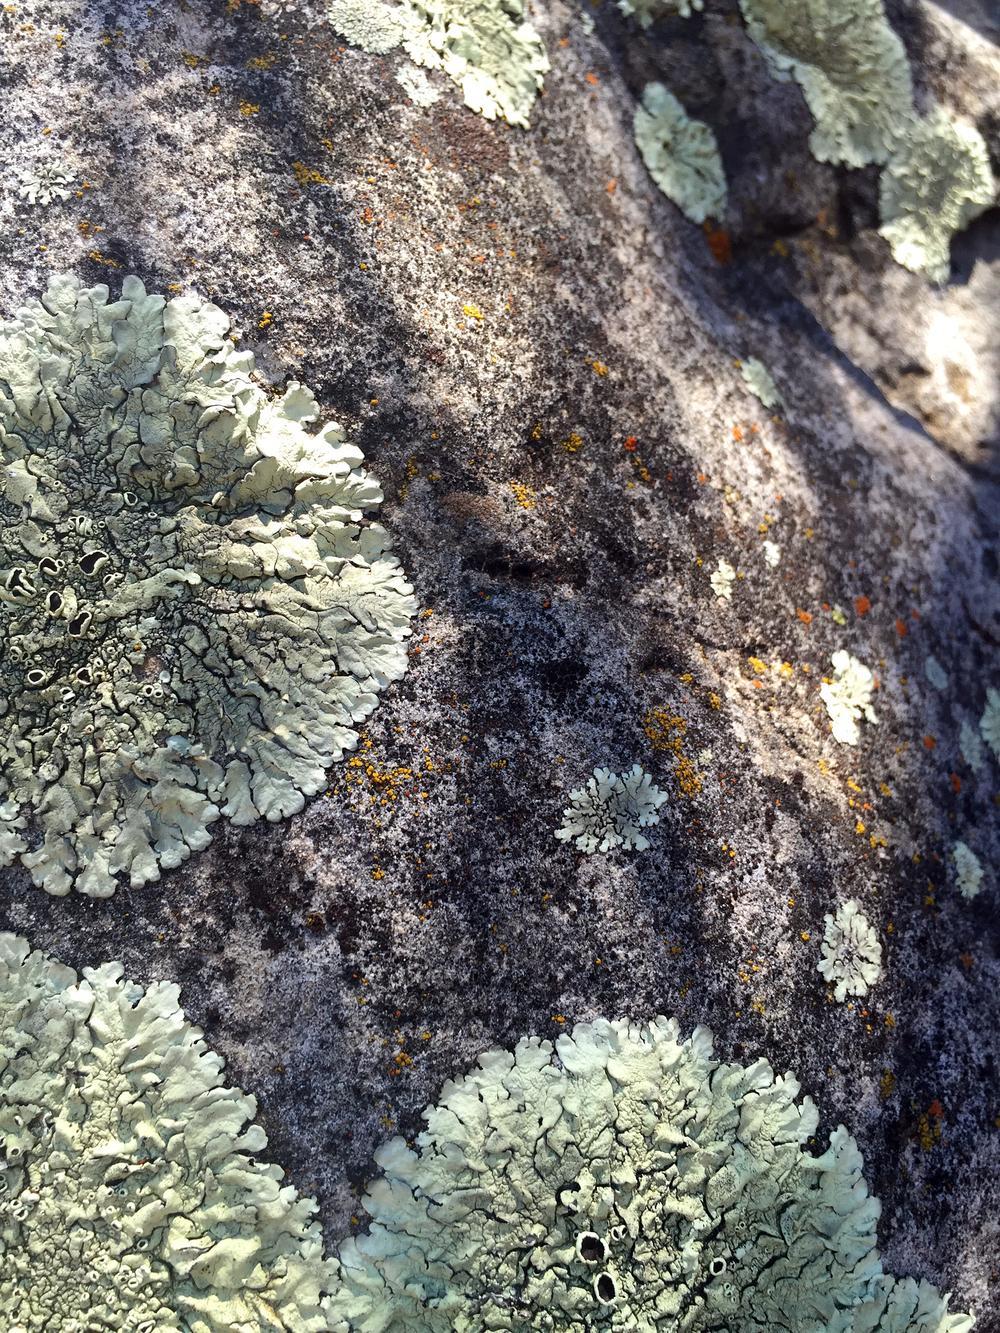 Texture in Matilija Canyon in Ojai, CA